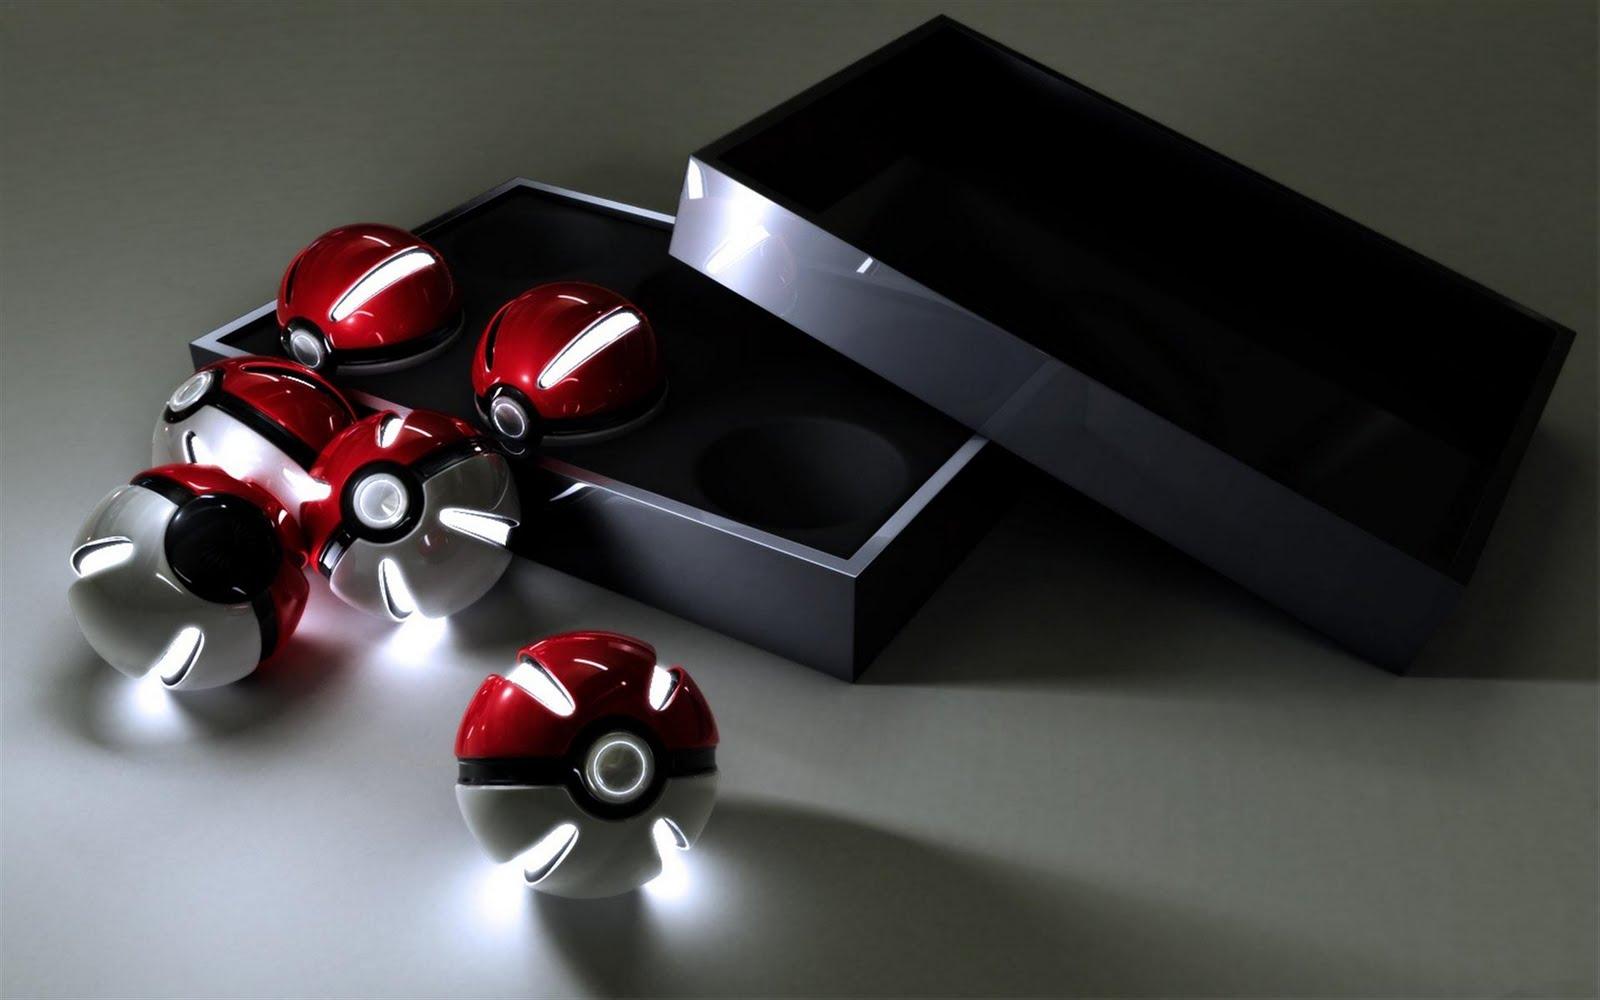 1625 <b>Pokemon HD Wallpapers</b> | <b>Backgrounds</b> - <b>Wallpaper</b> Abyss